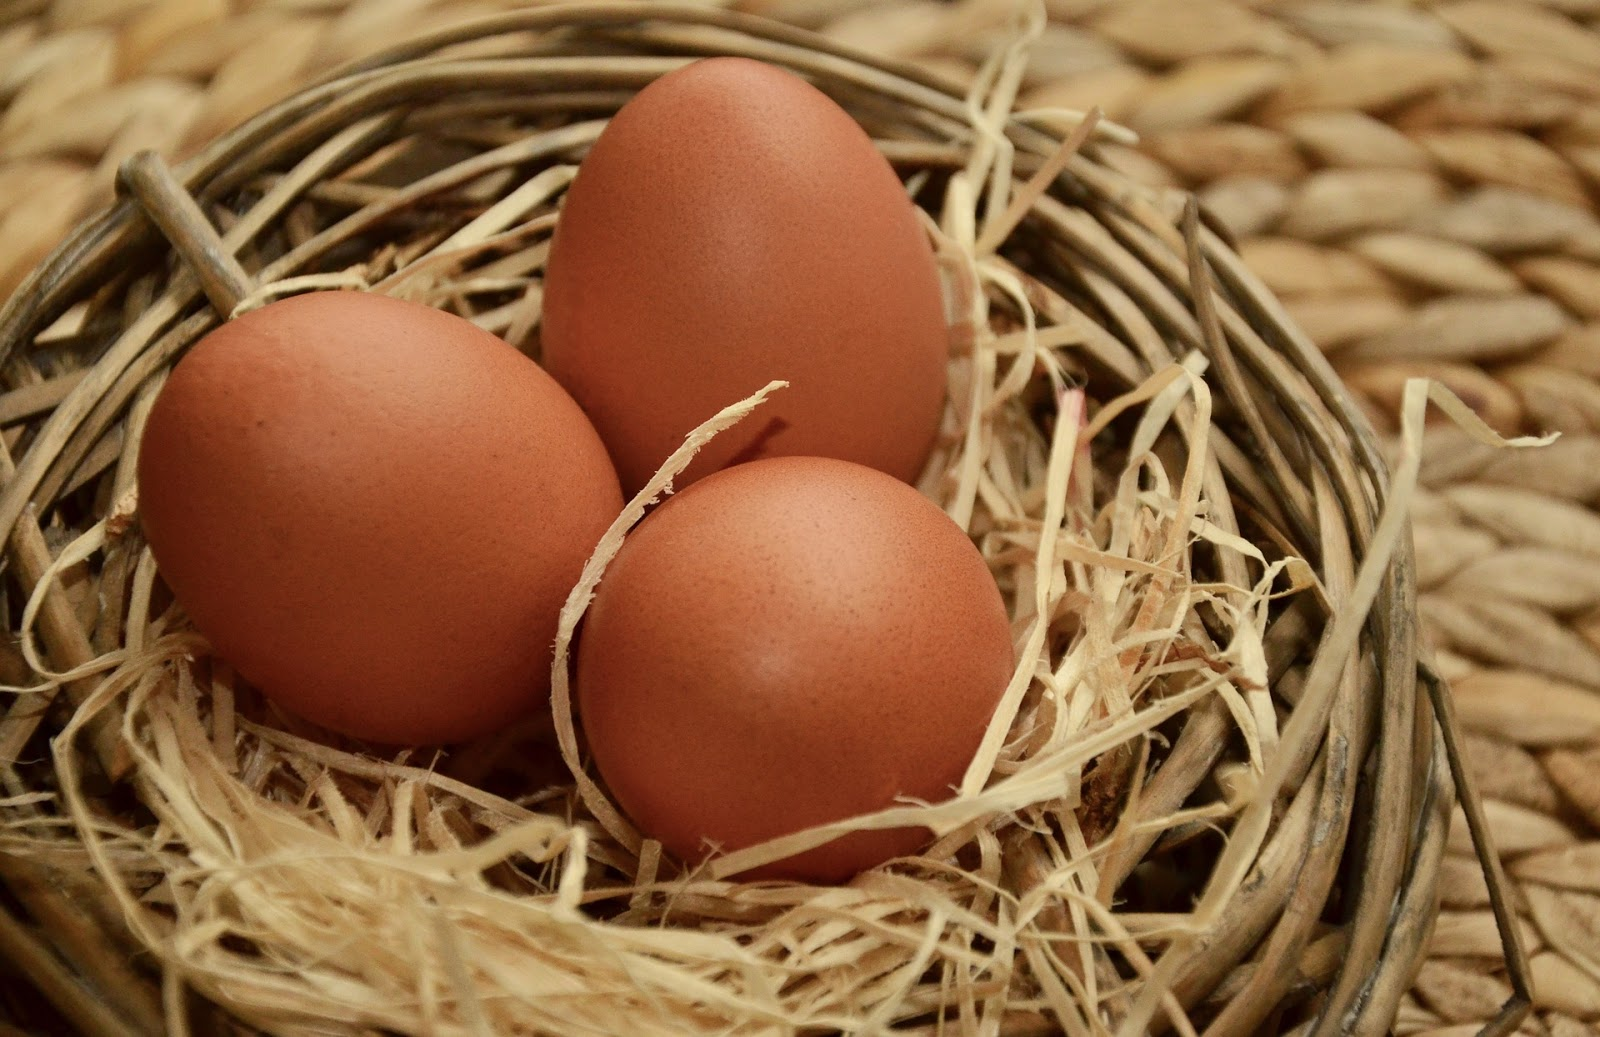 Кошмар, яйца картинки красивые